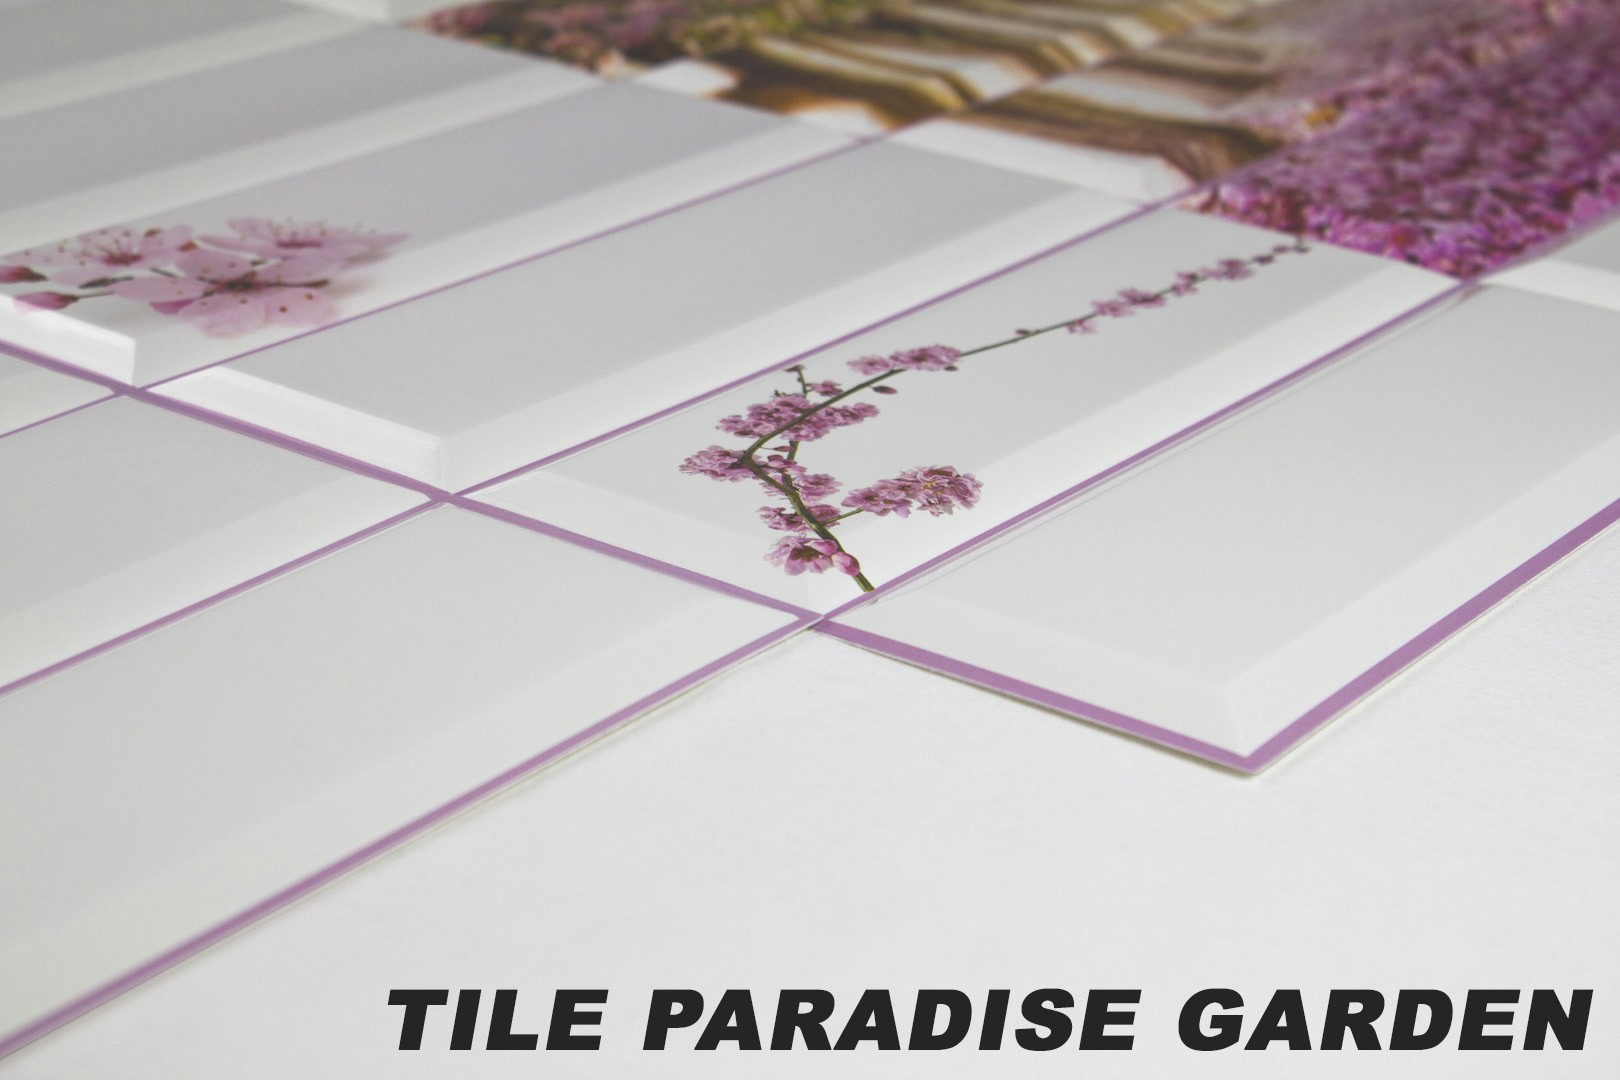 Tile paradise garden originalbild 1